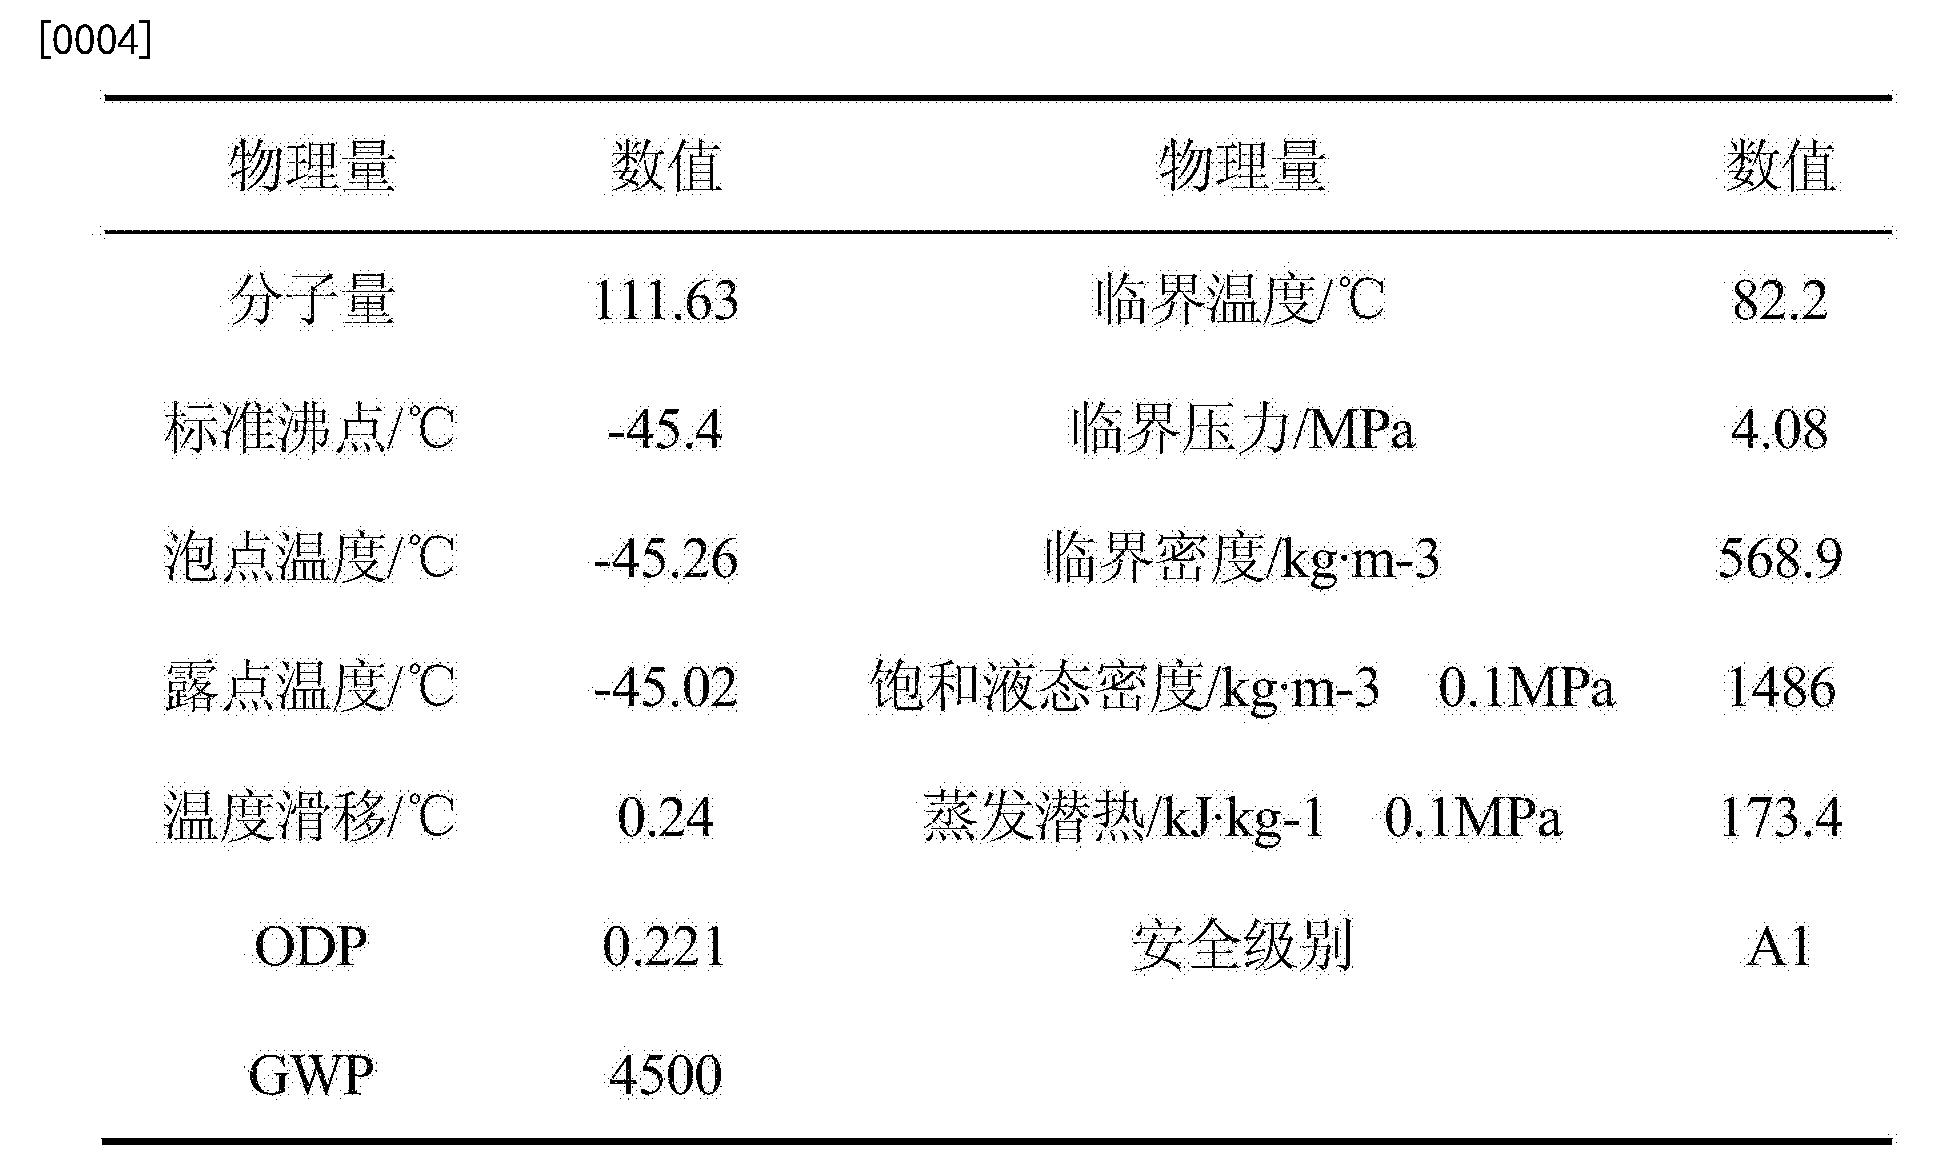 CN104263322B - An alternative mixed refrigerant and its preparation